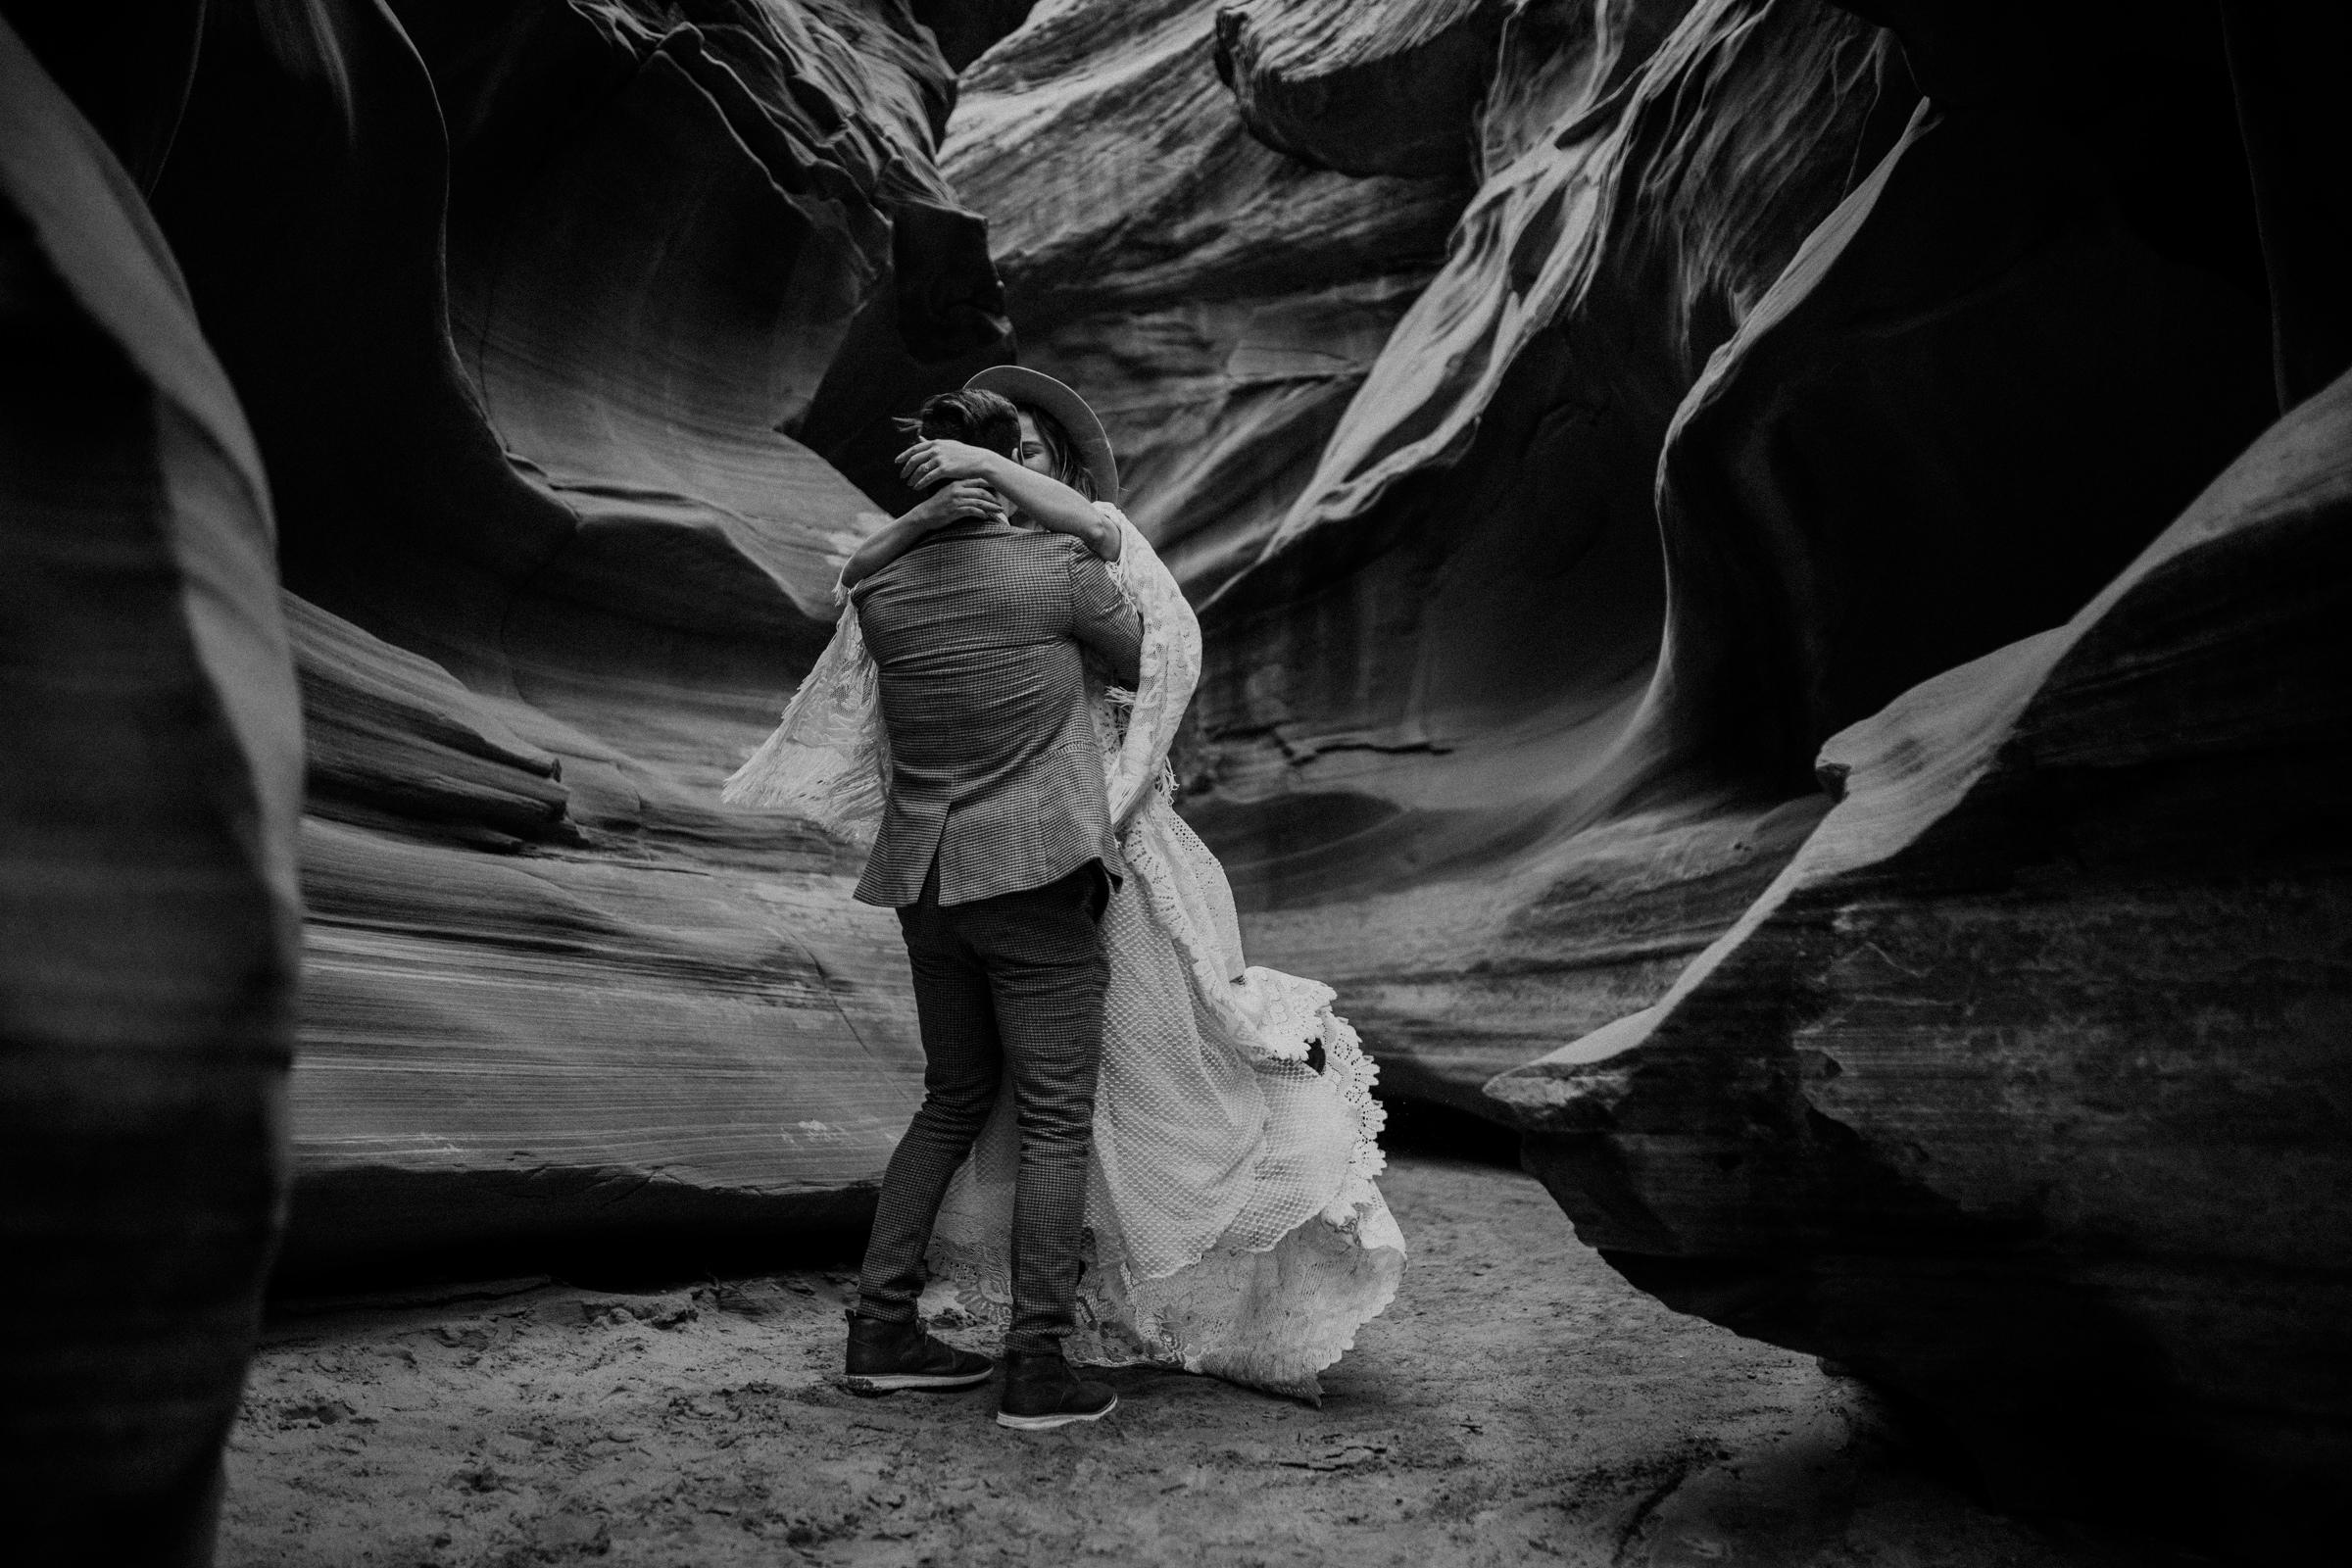 arizona-adventure-elopements-in-slot-canyons.jpg